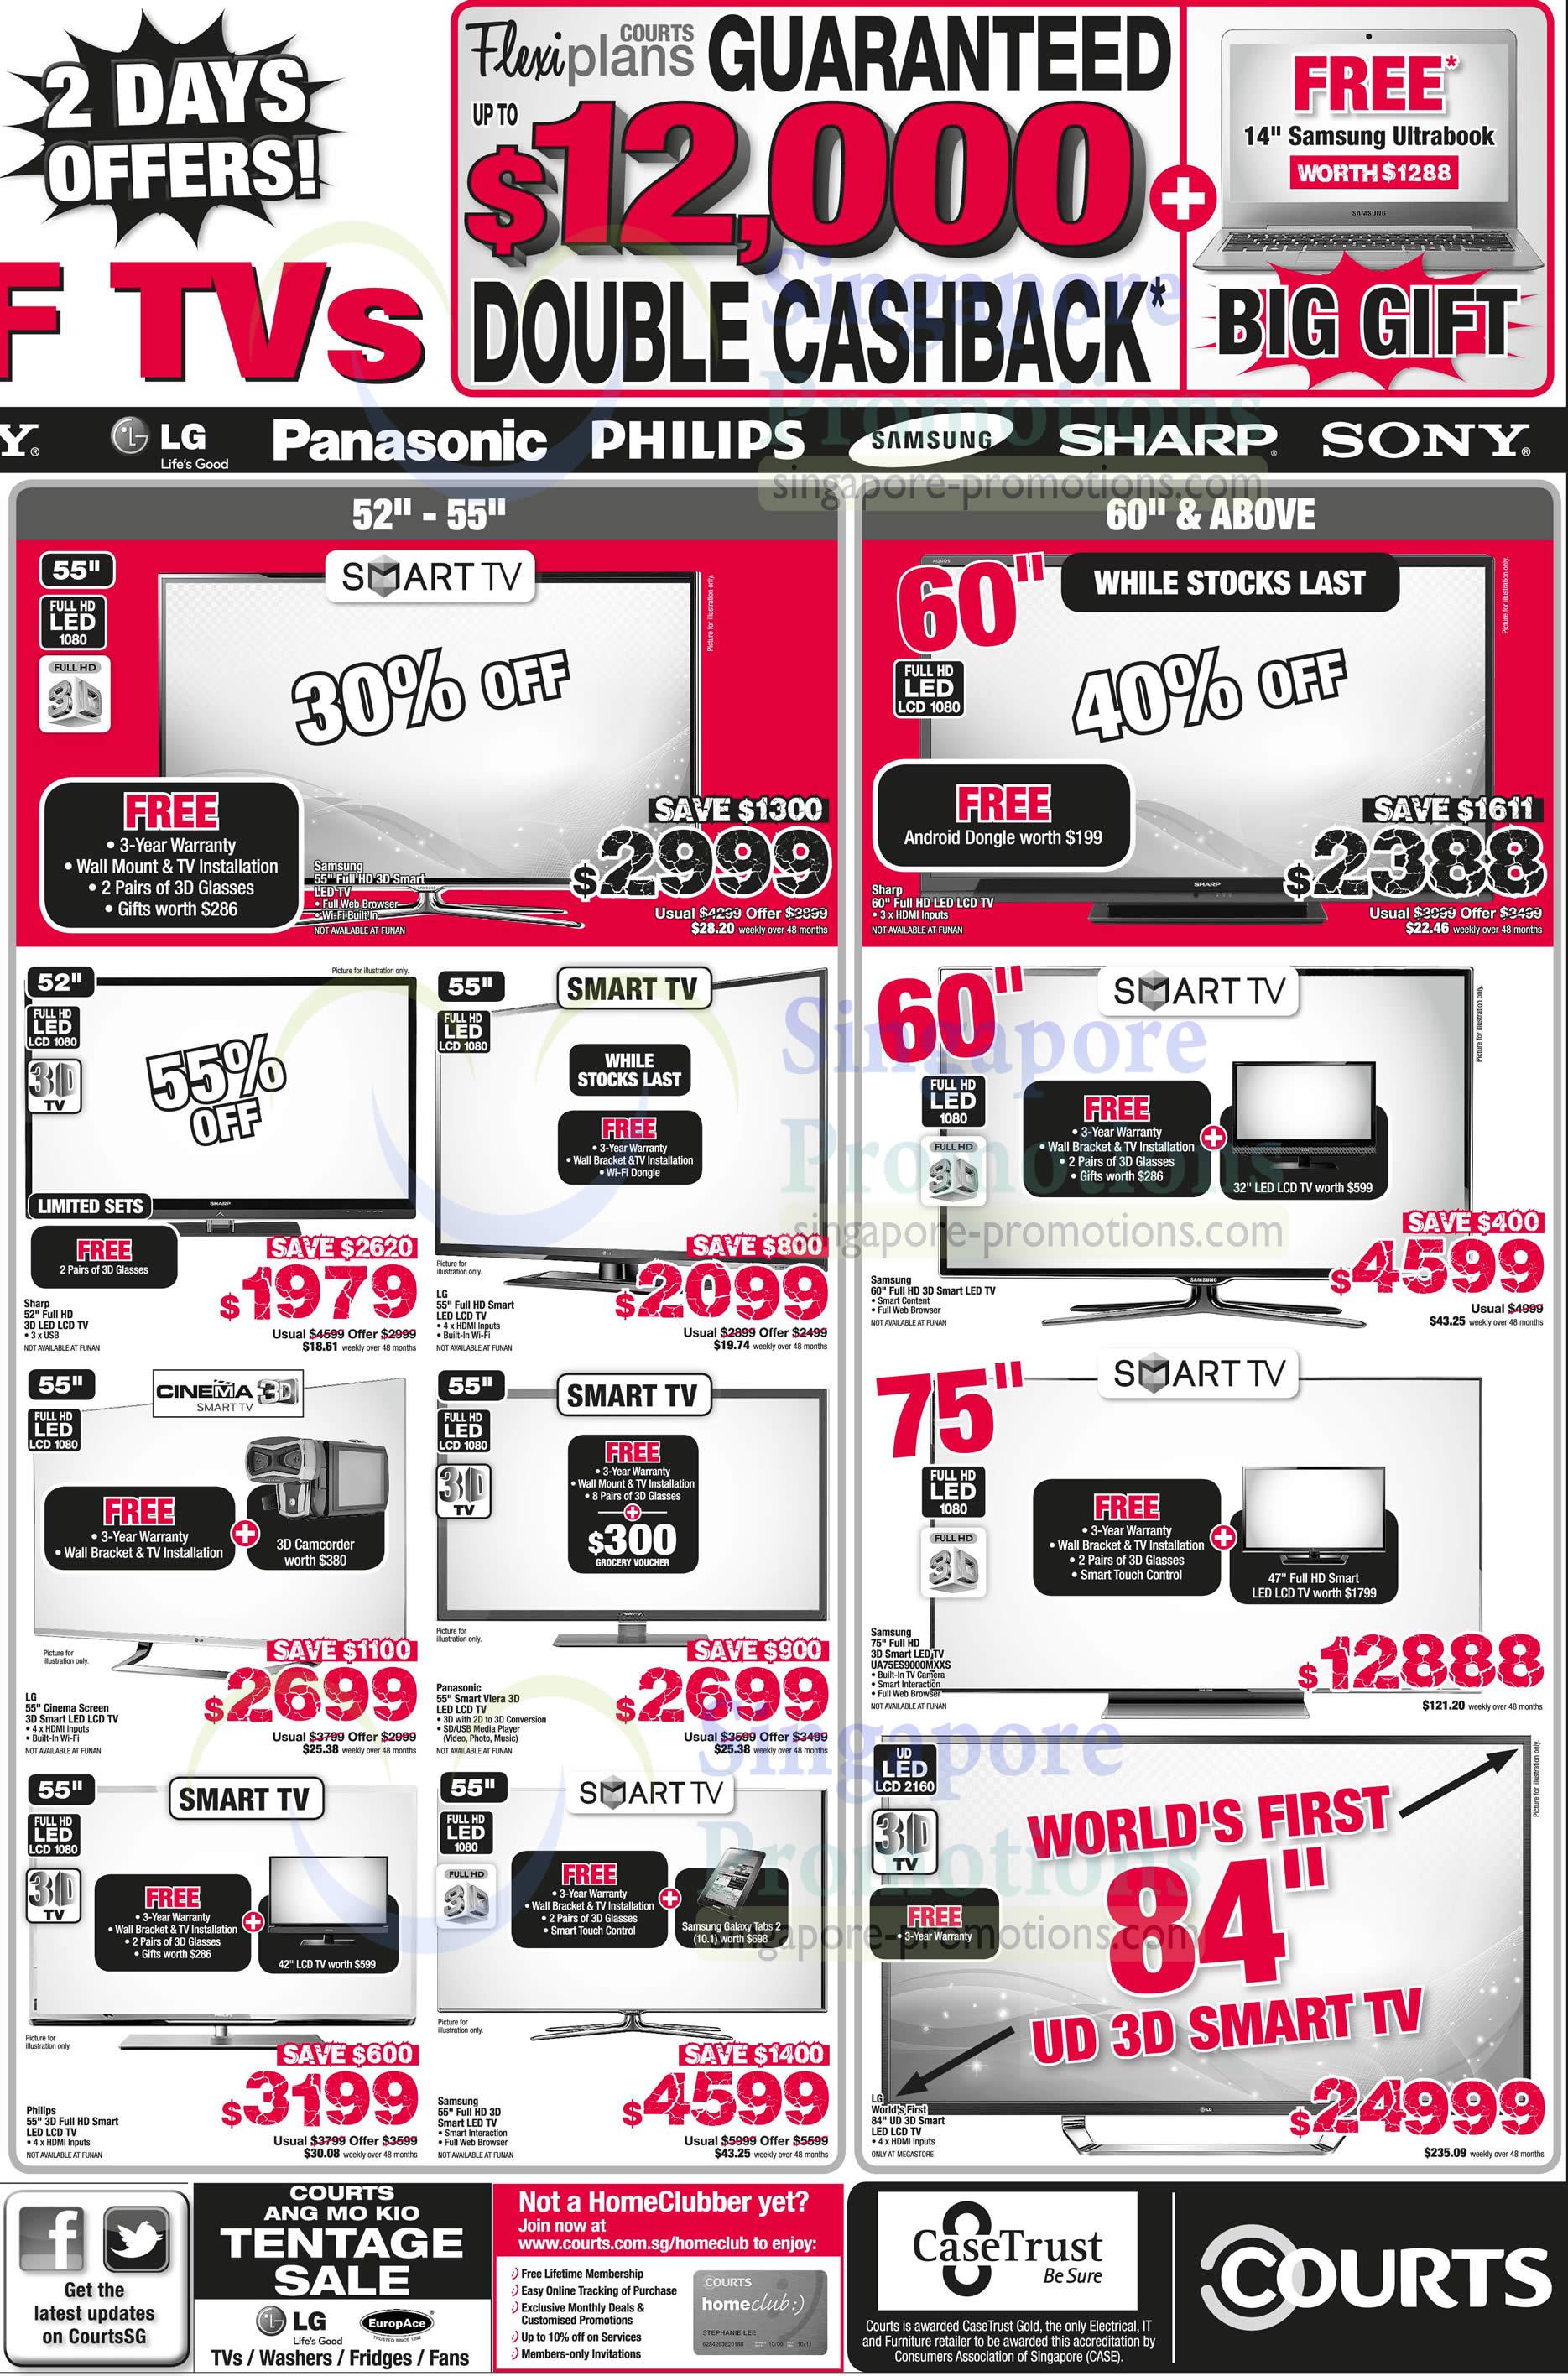 LED TVs, Panasonic, Samsung, LG, Philips, Sharp